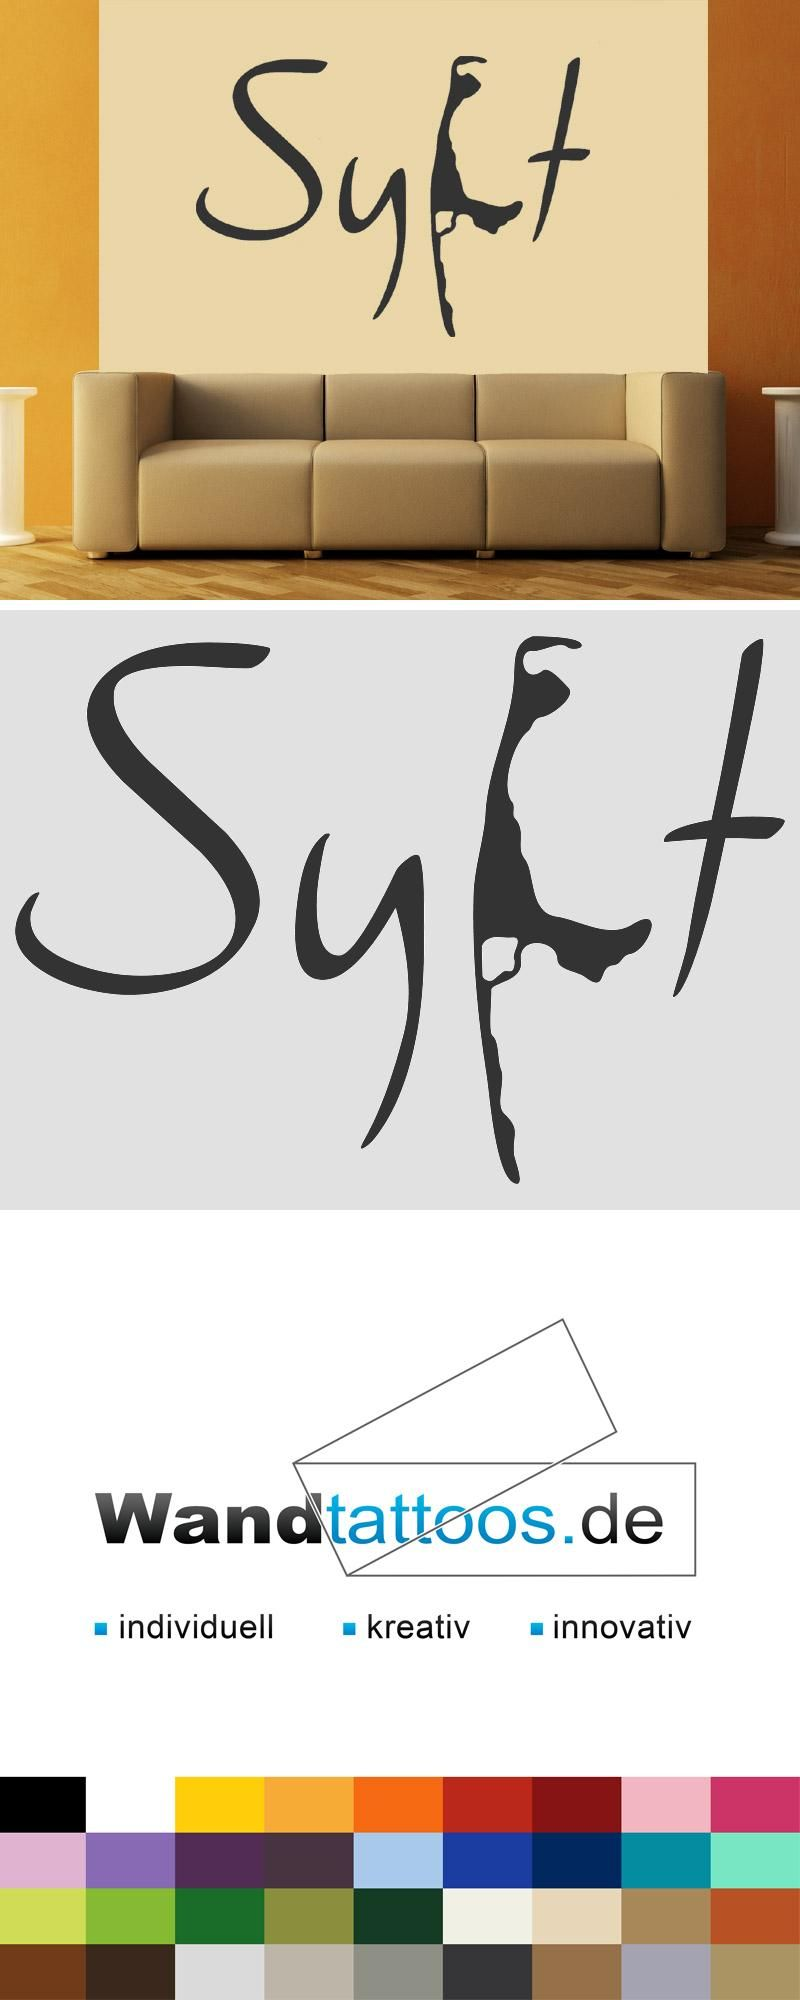 Wandtattoo Sylt mit Umriss der Insel | Pinterest | Wandtattoos, Sylt ...